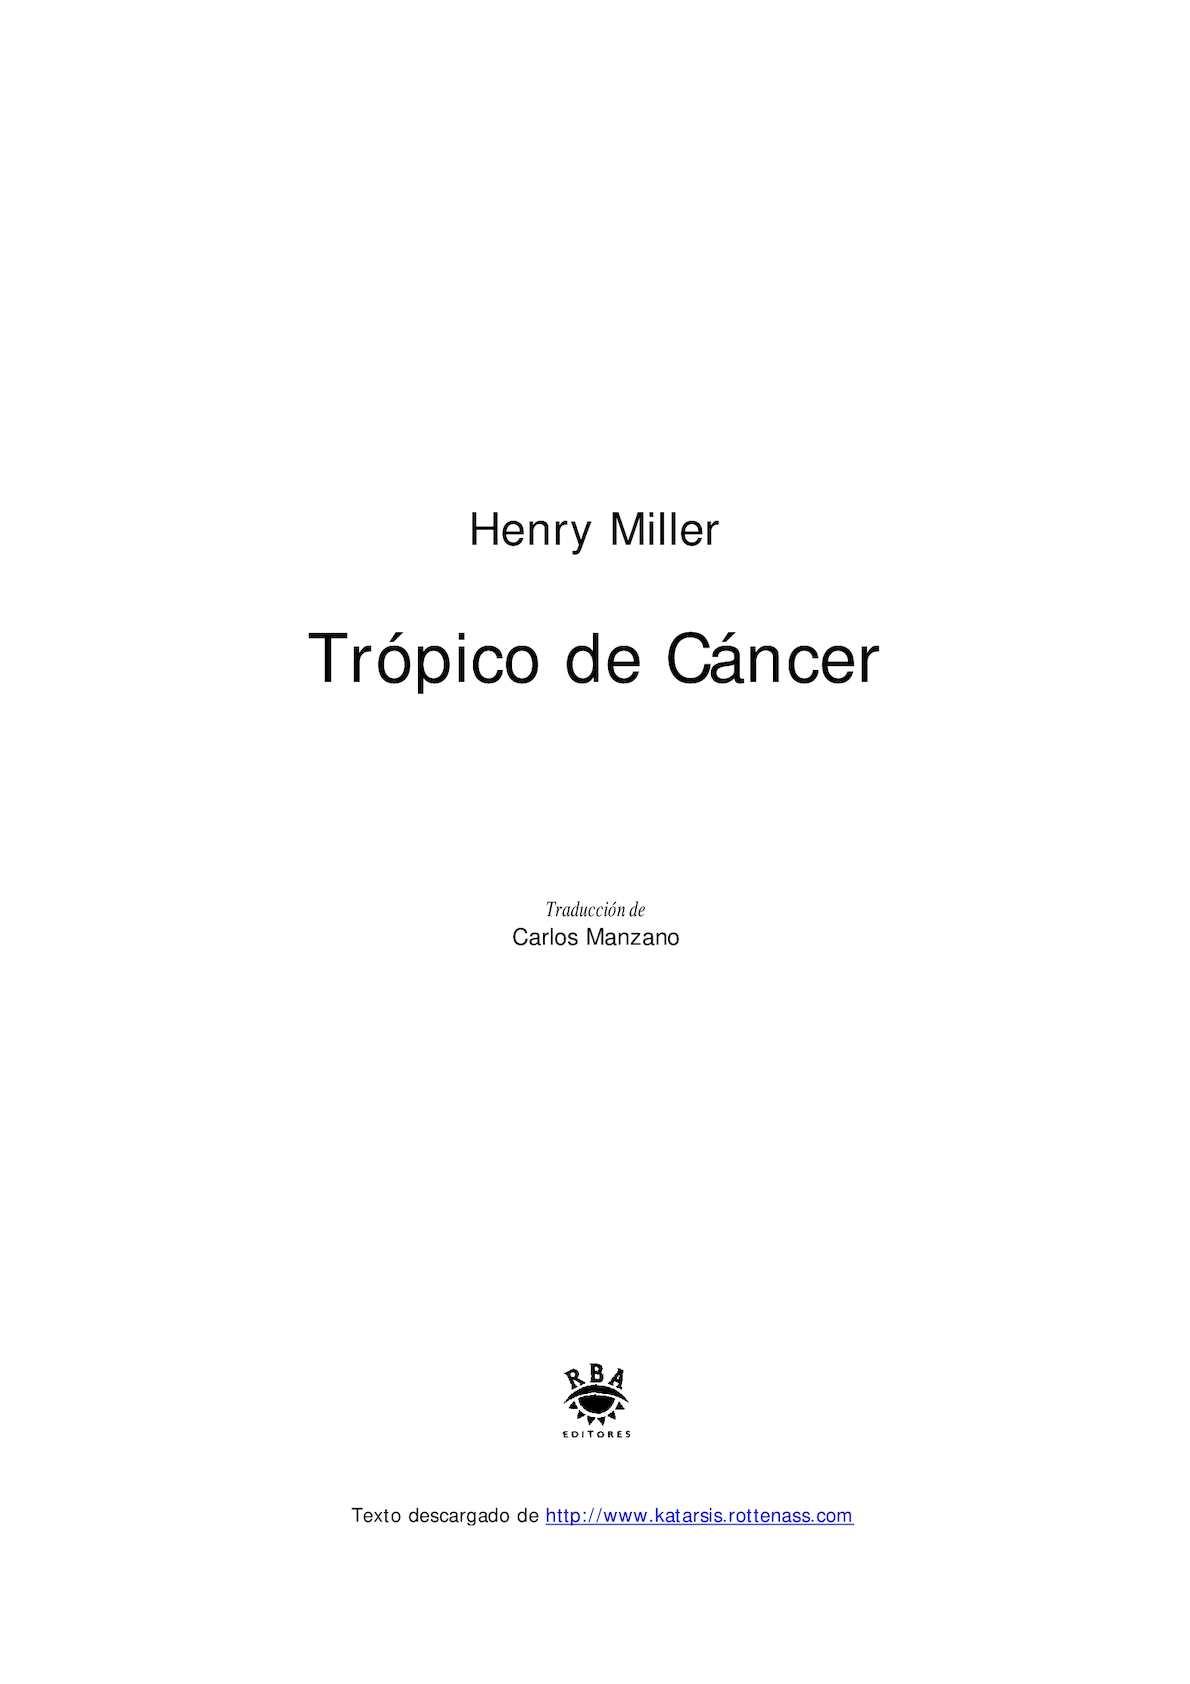 tumori maligne - Traduction en français - exemples roumain | Reverso Context